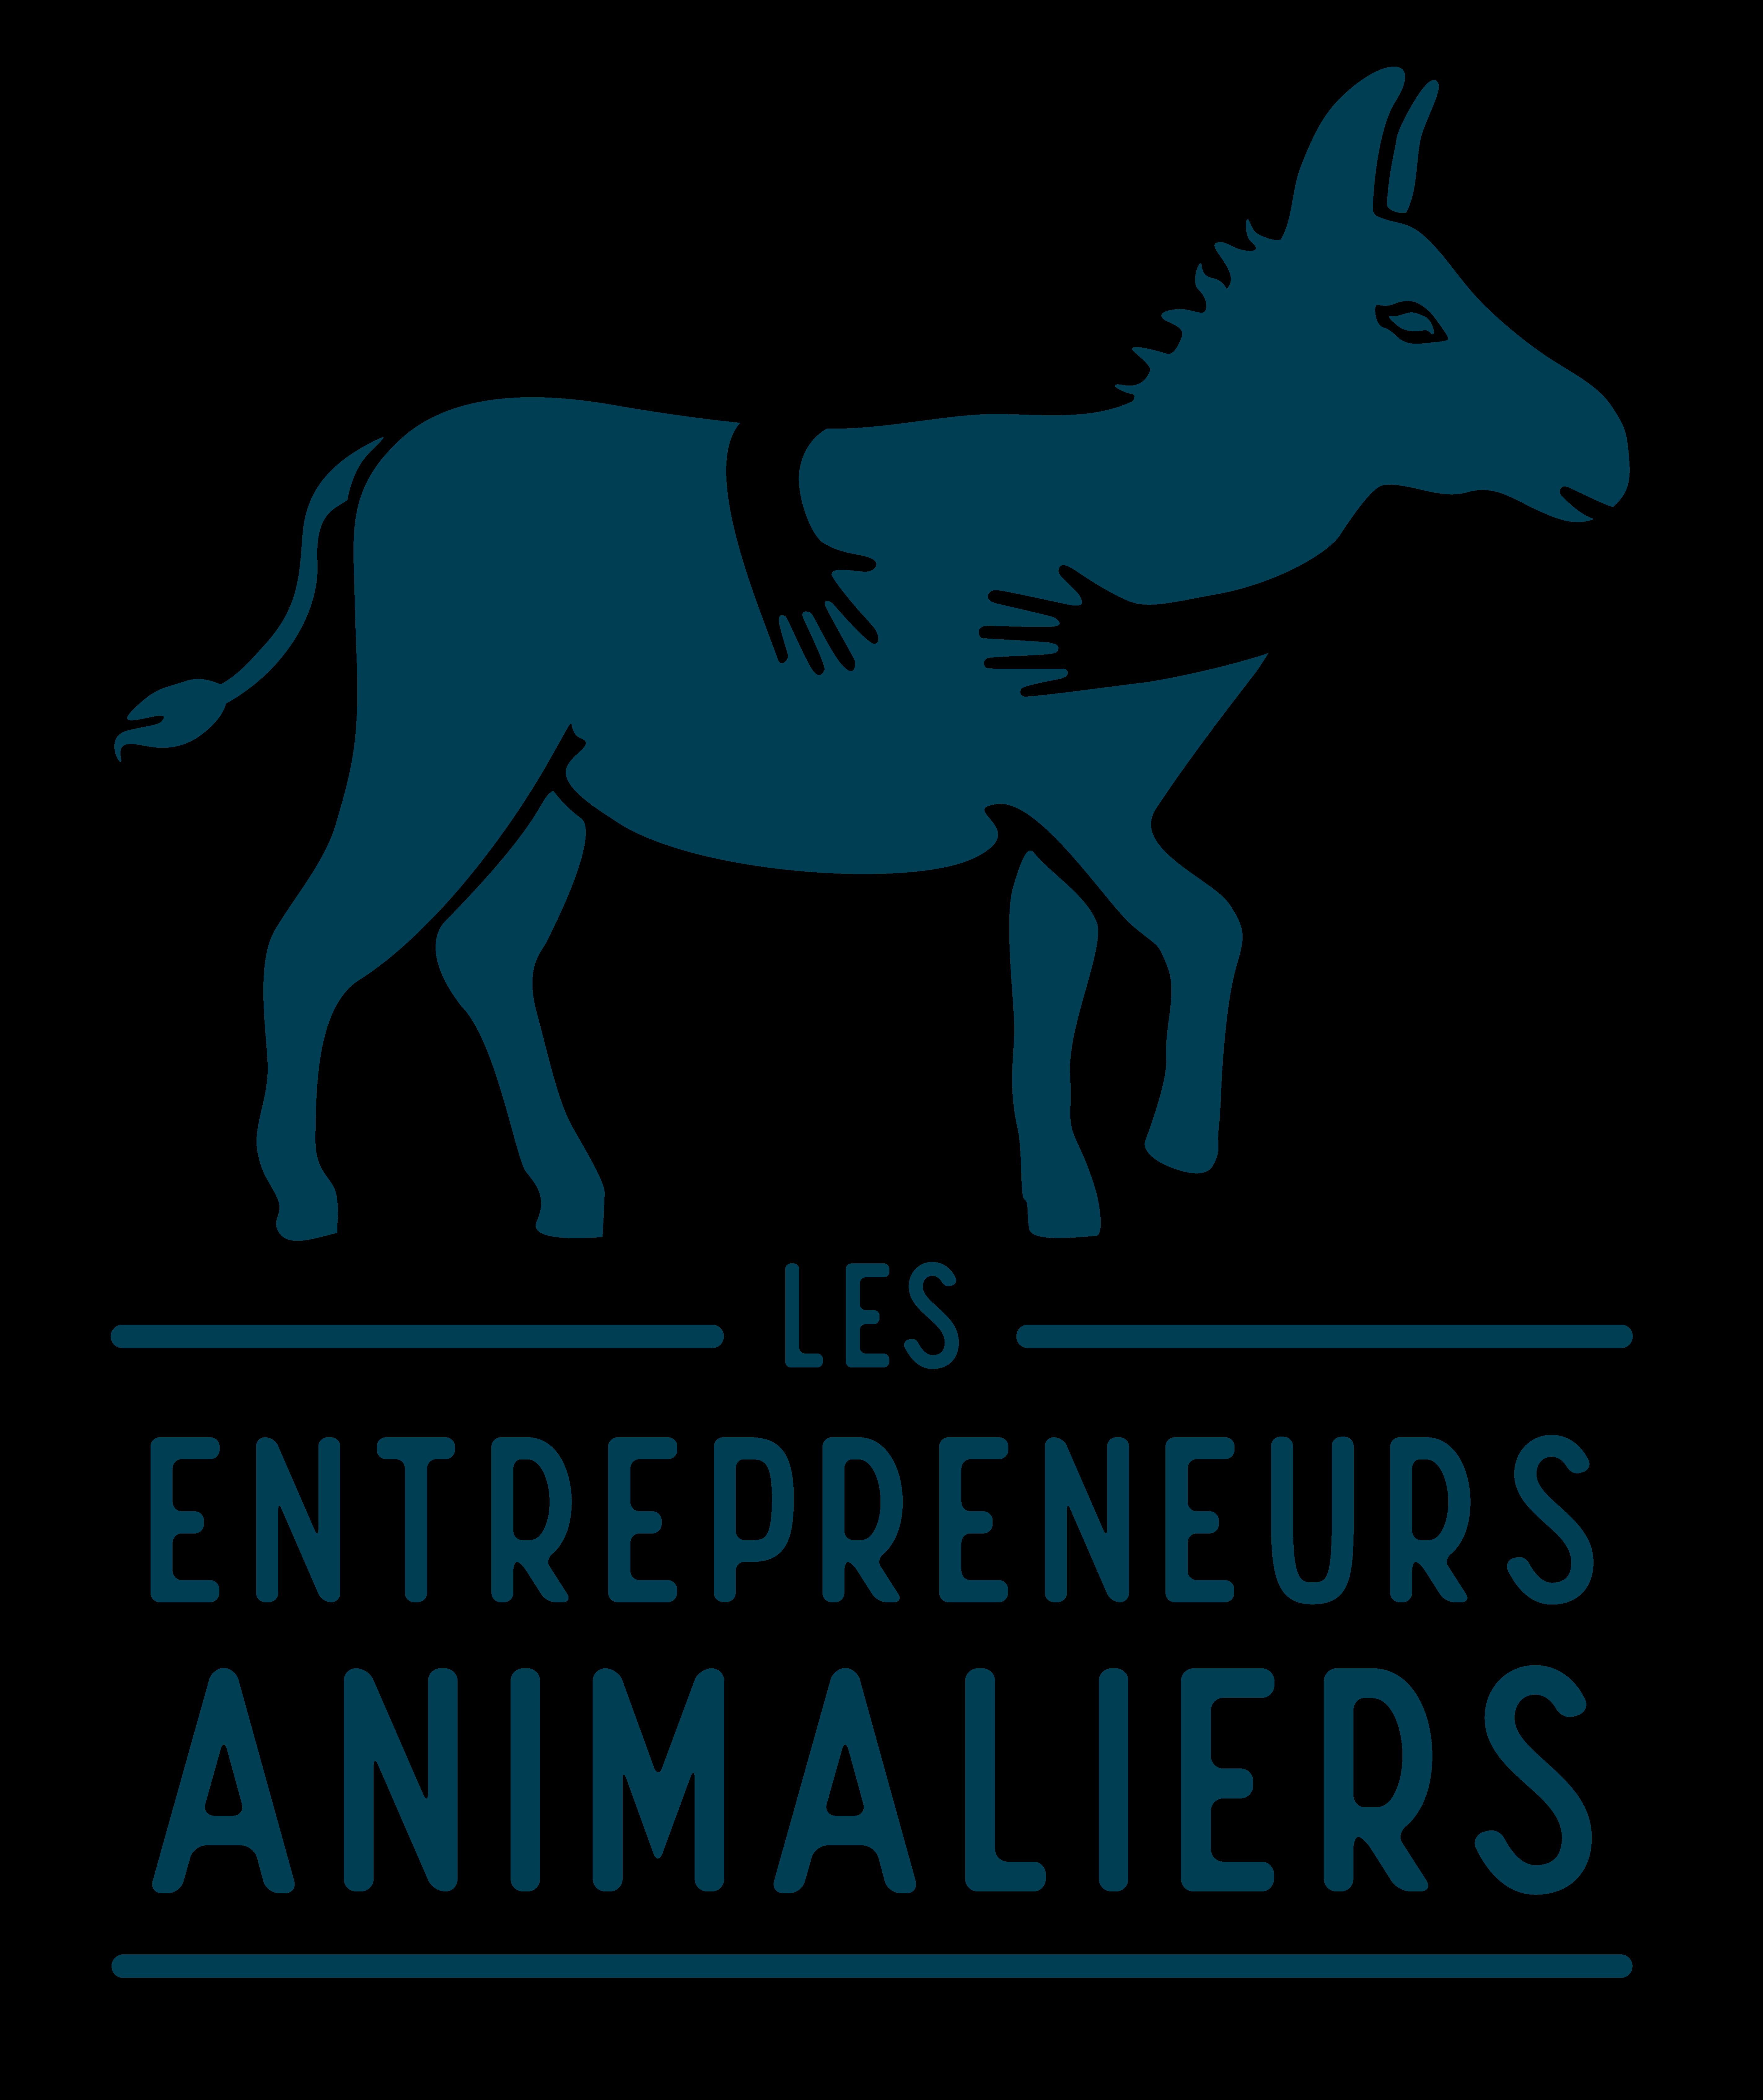 Les entrepreneurs animaliers